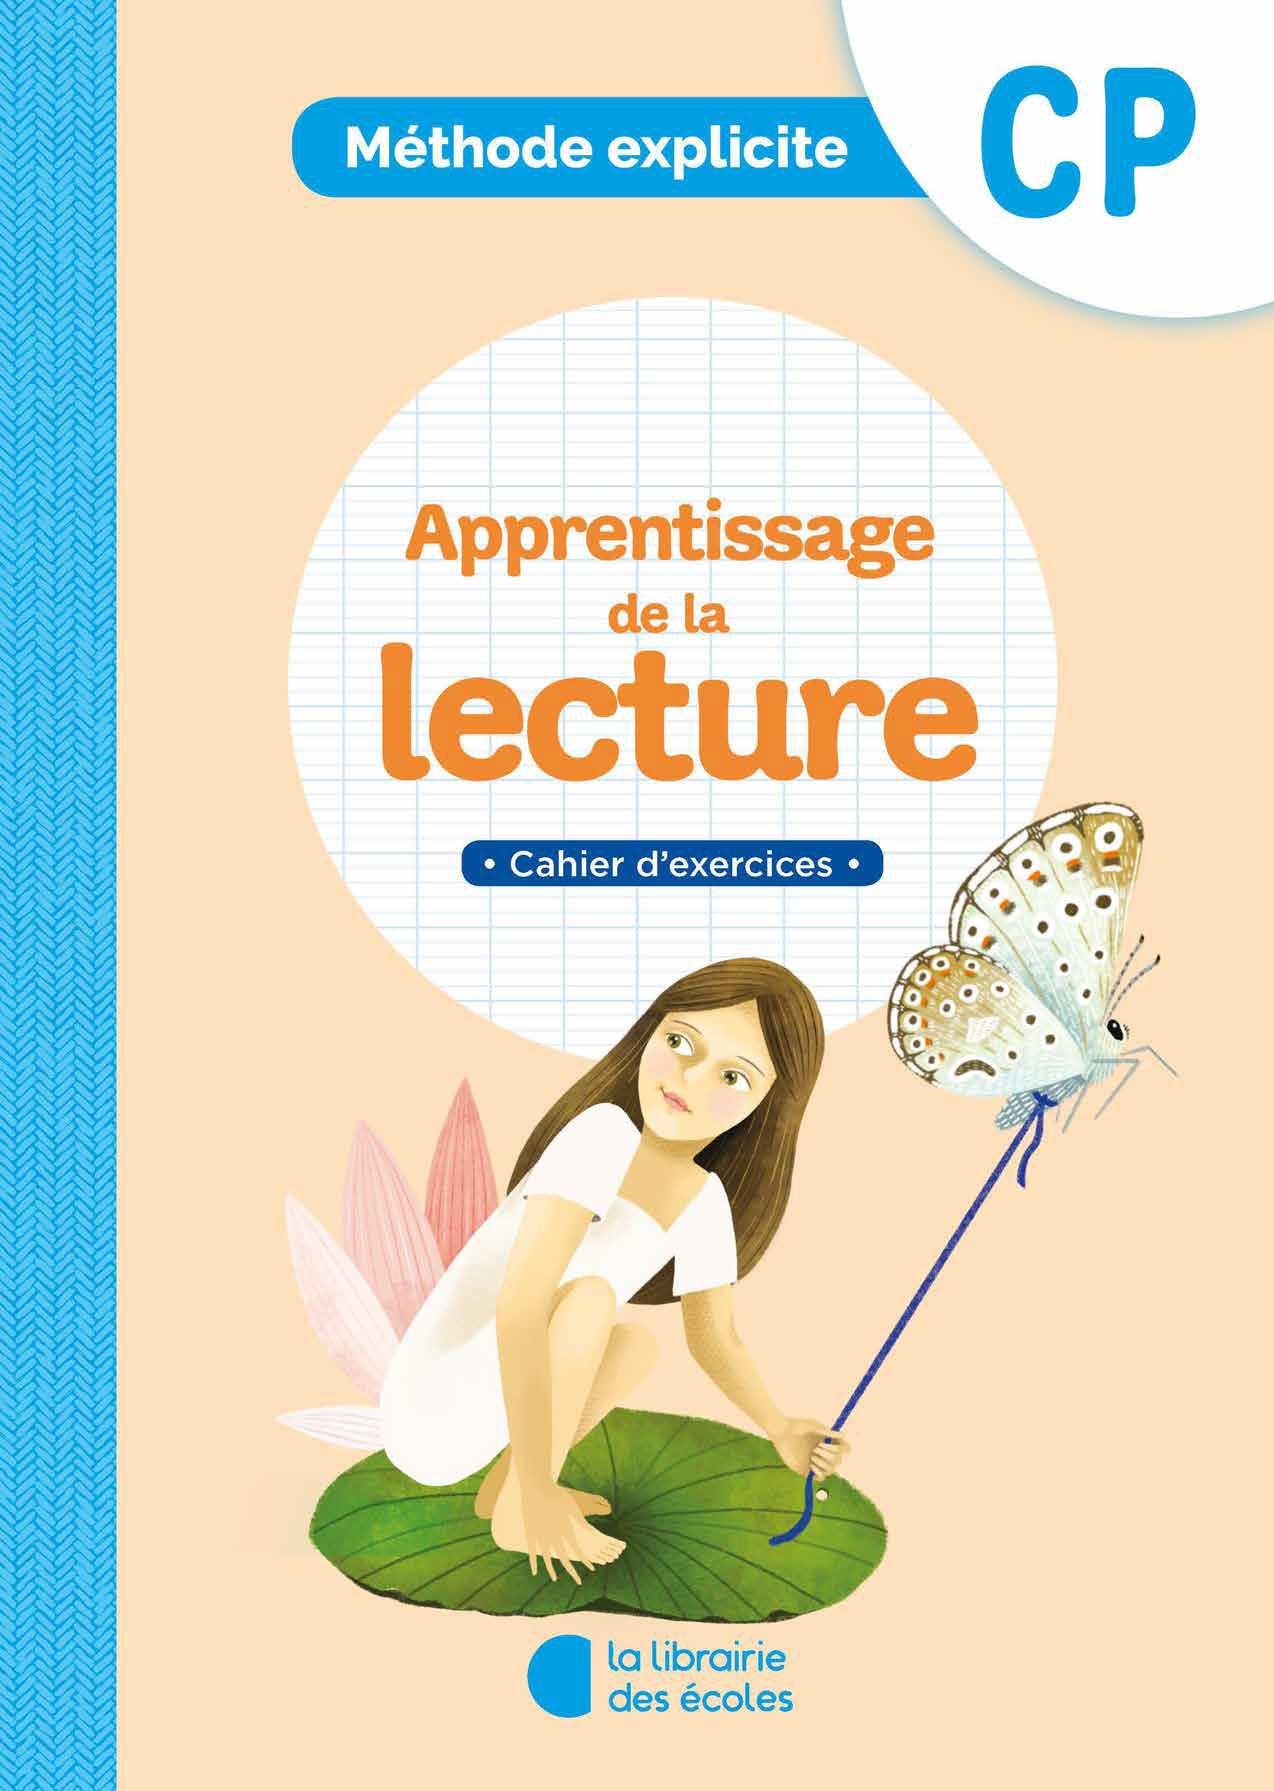 Méthode explicite   Lecture   Cahier d'exercices   CP